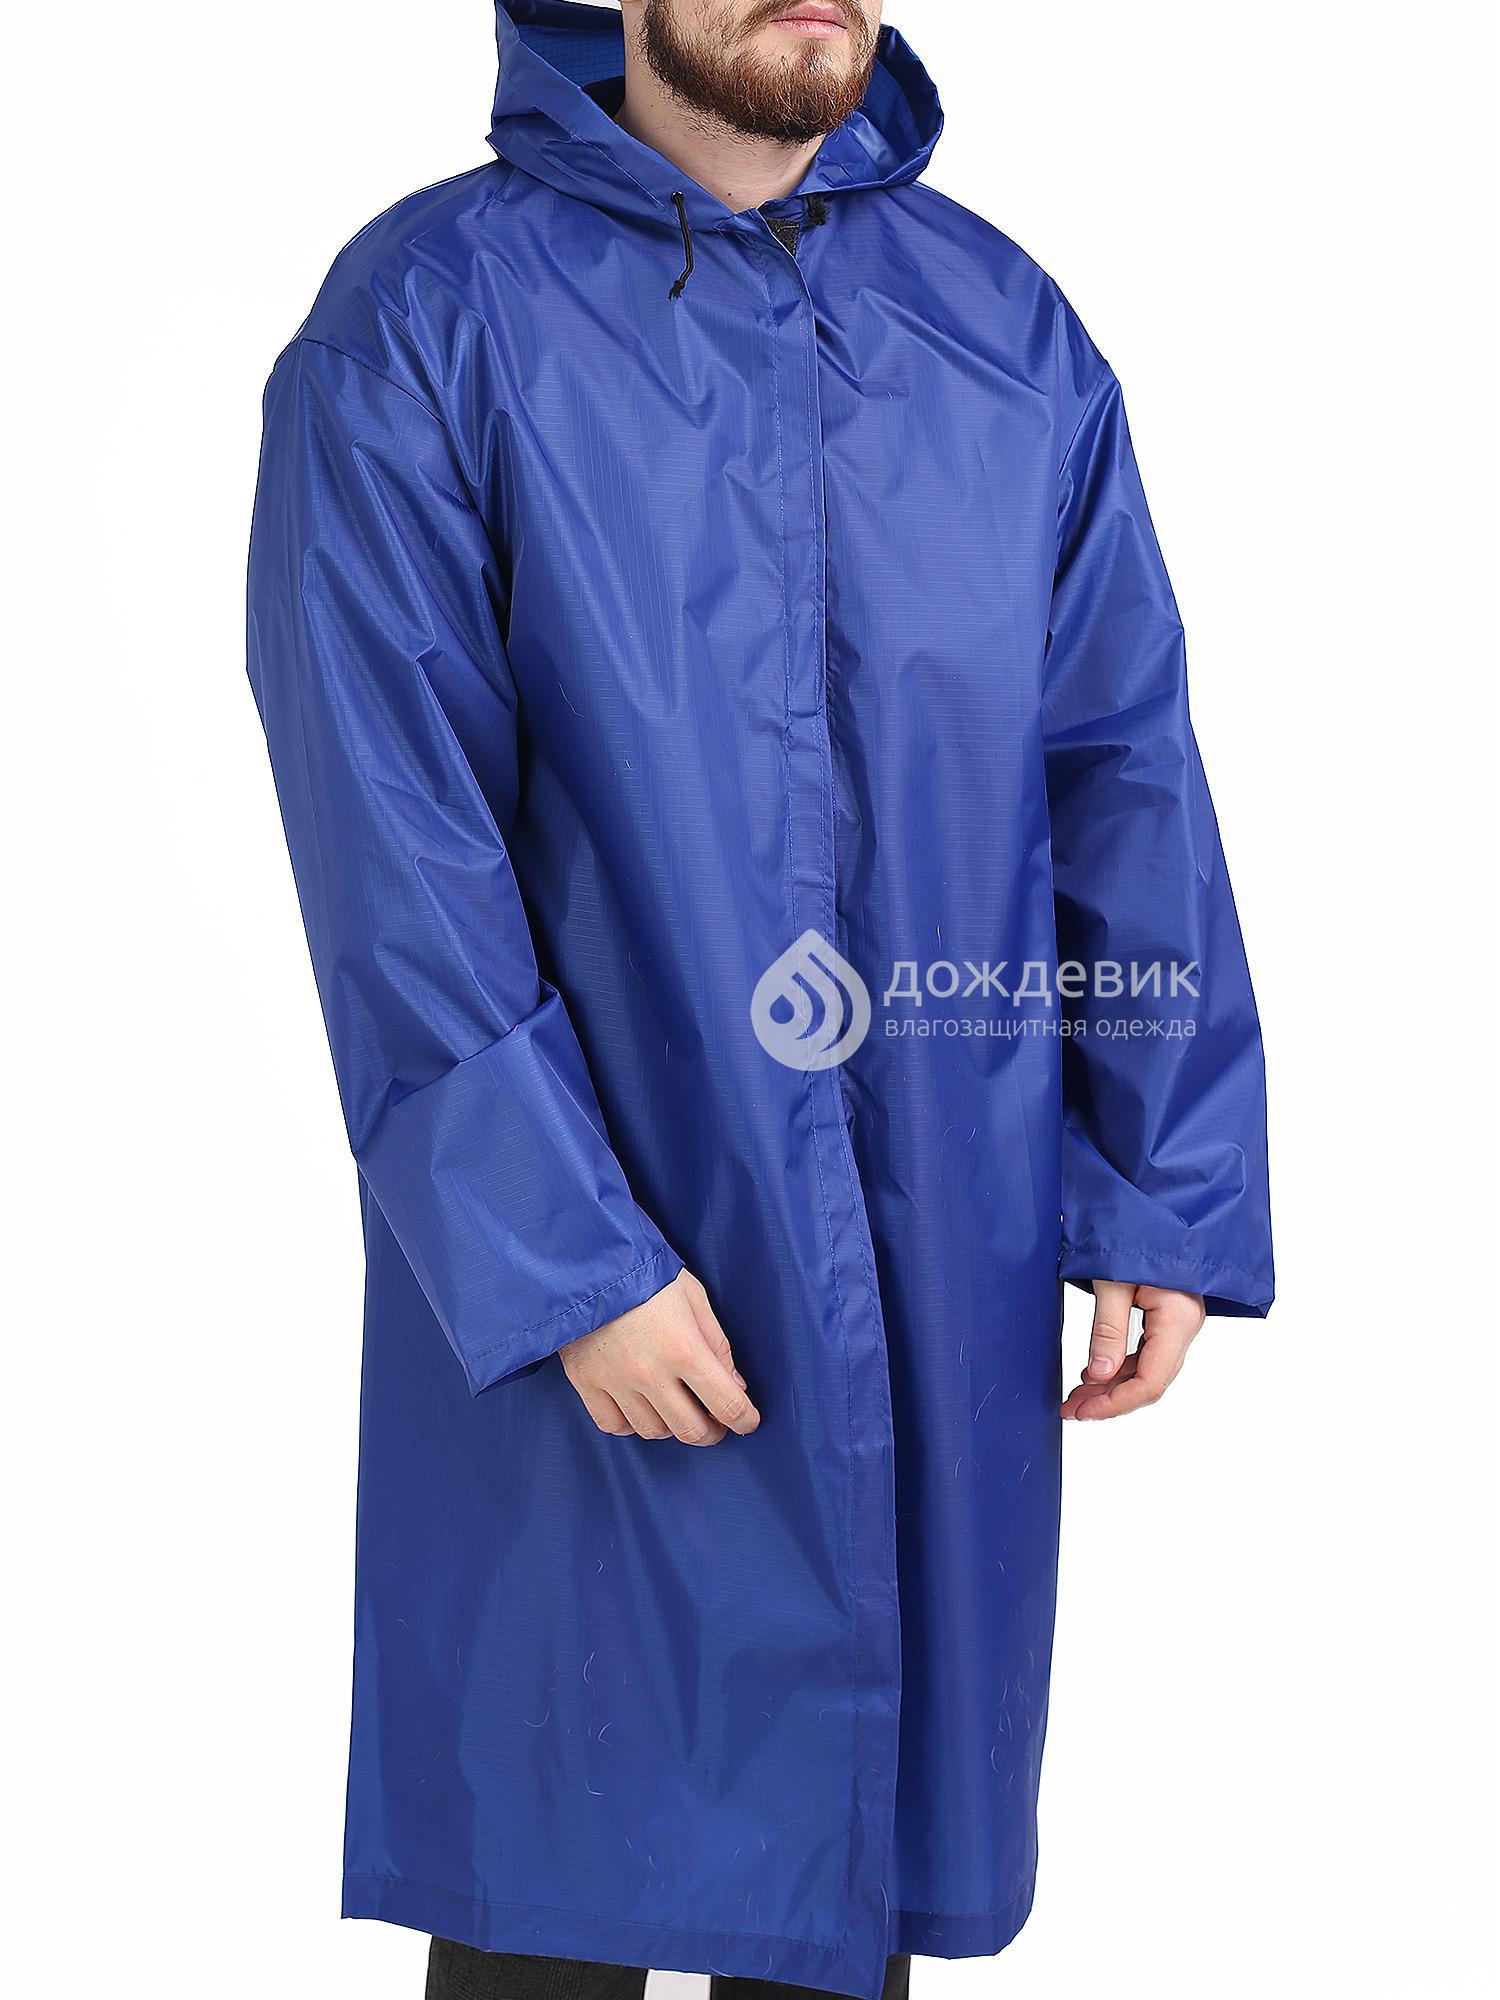 Плащ-дождевик тканевый синий Таффета